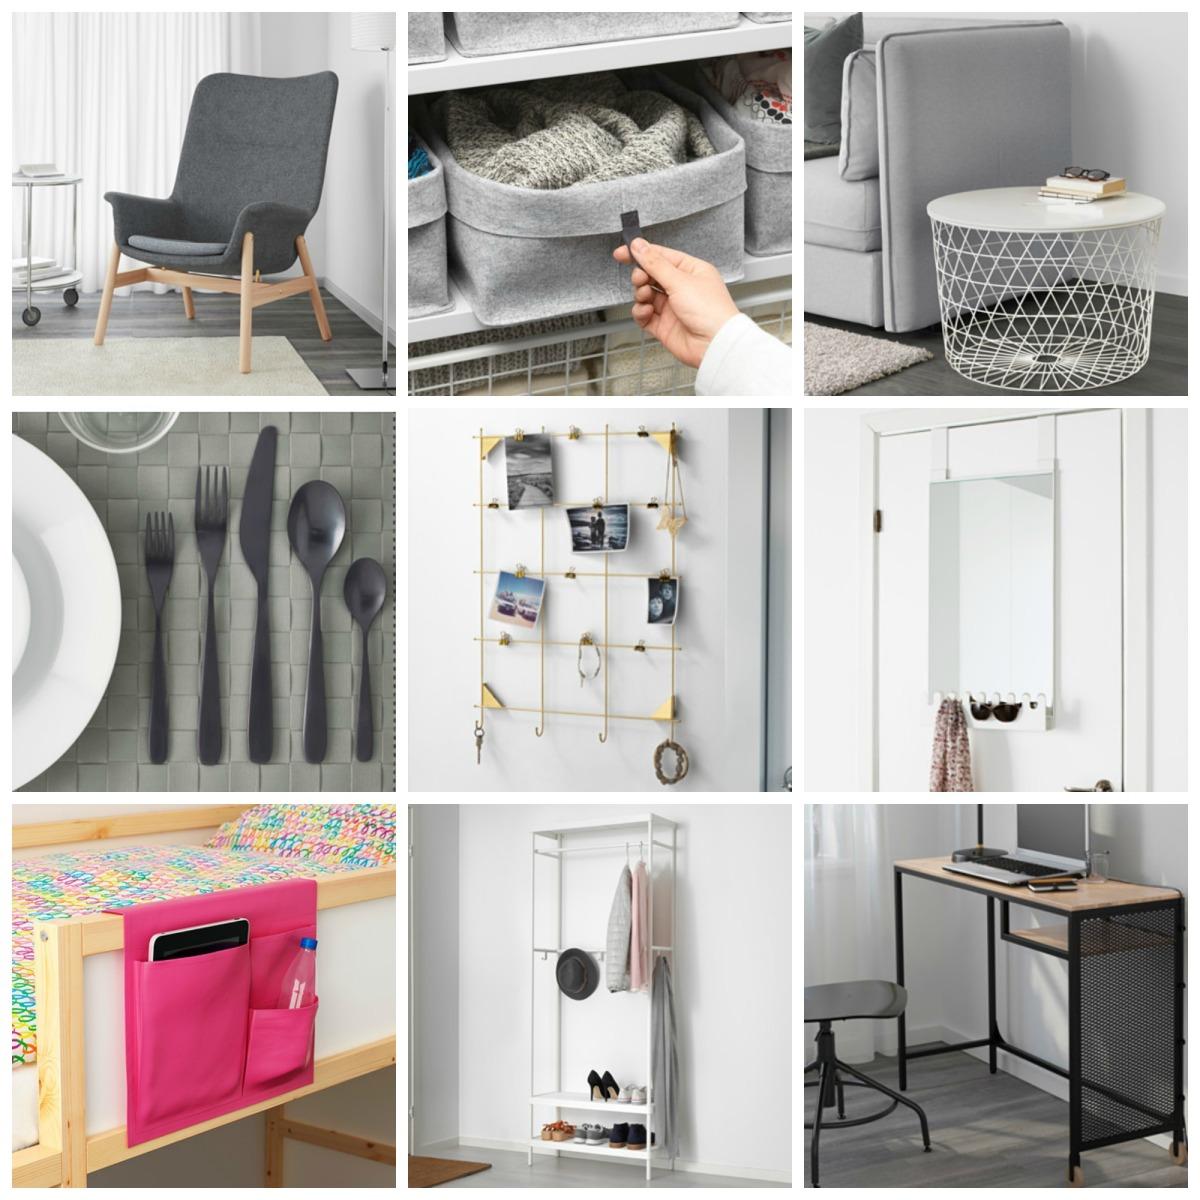 Ikea 2018 catalogue wish list the elm life for Ikea new catalogue 2018